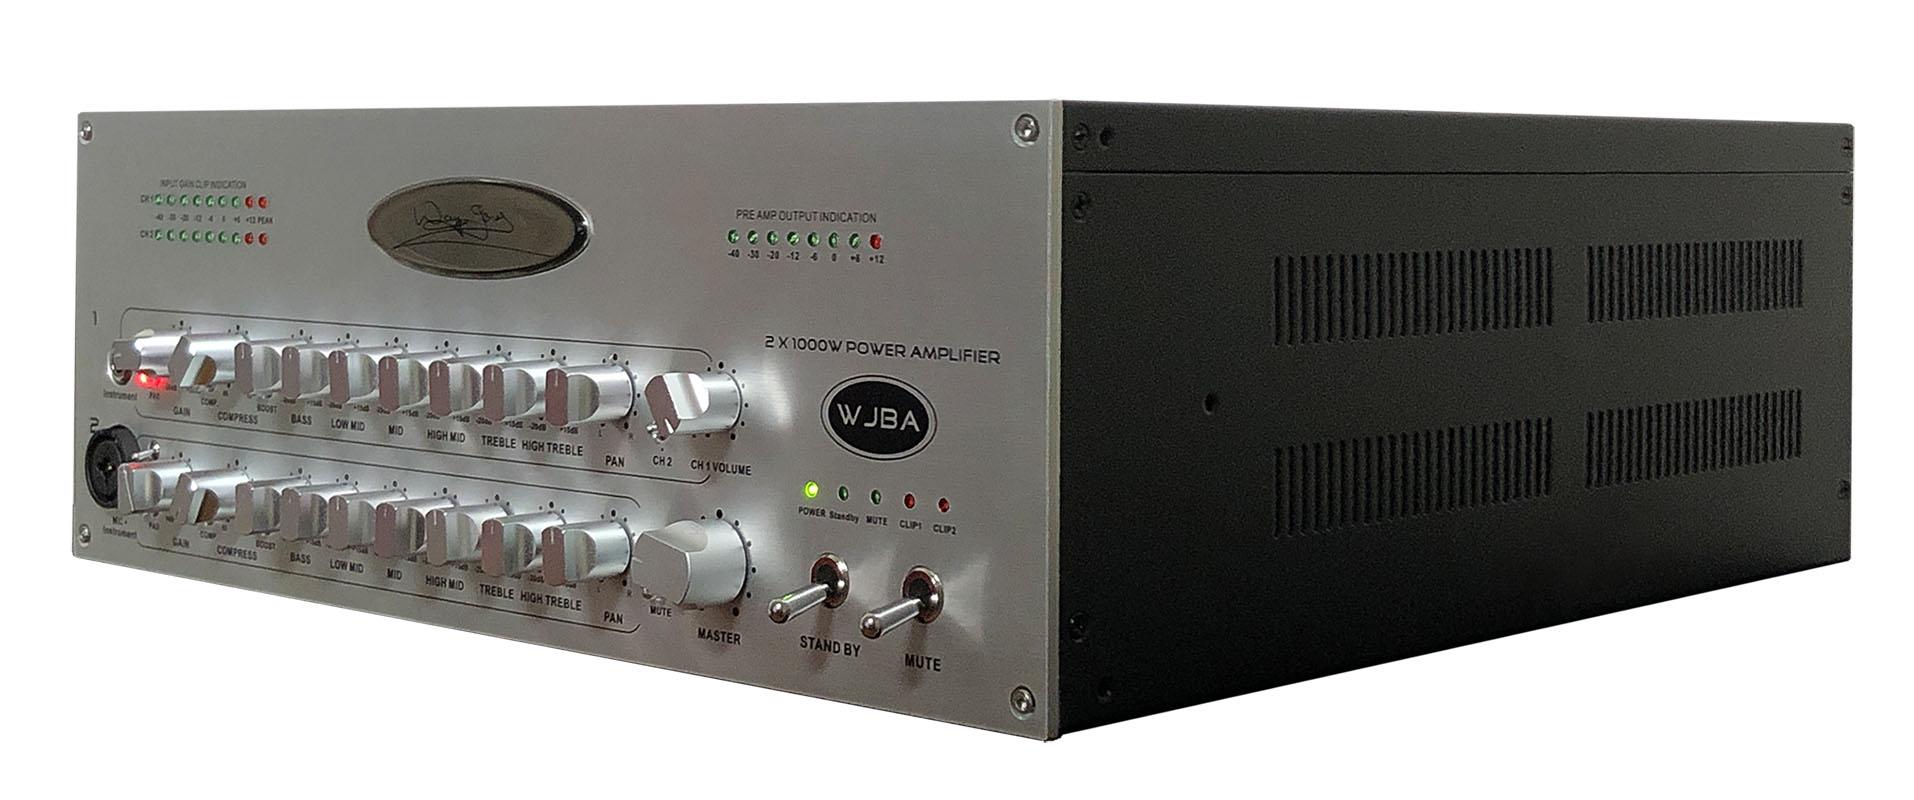 wjba 2000 watt bass guitar amplifier wayne jones audio. Black Bedroom Furniture Sets. Home Design Ideas